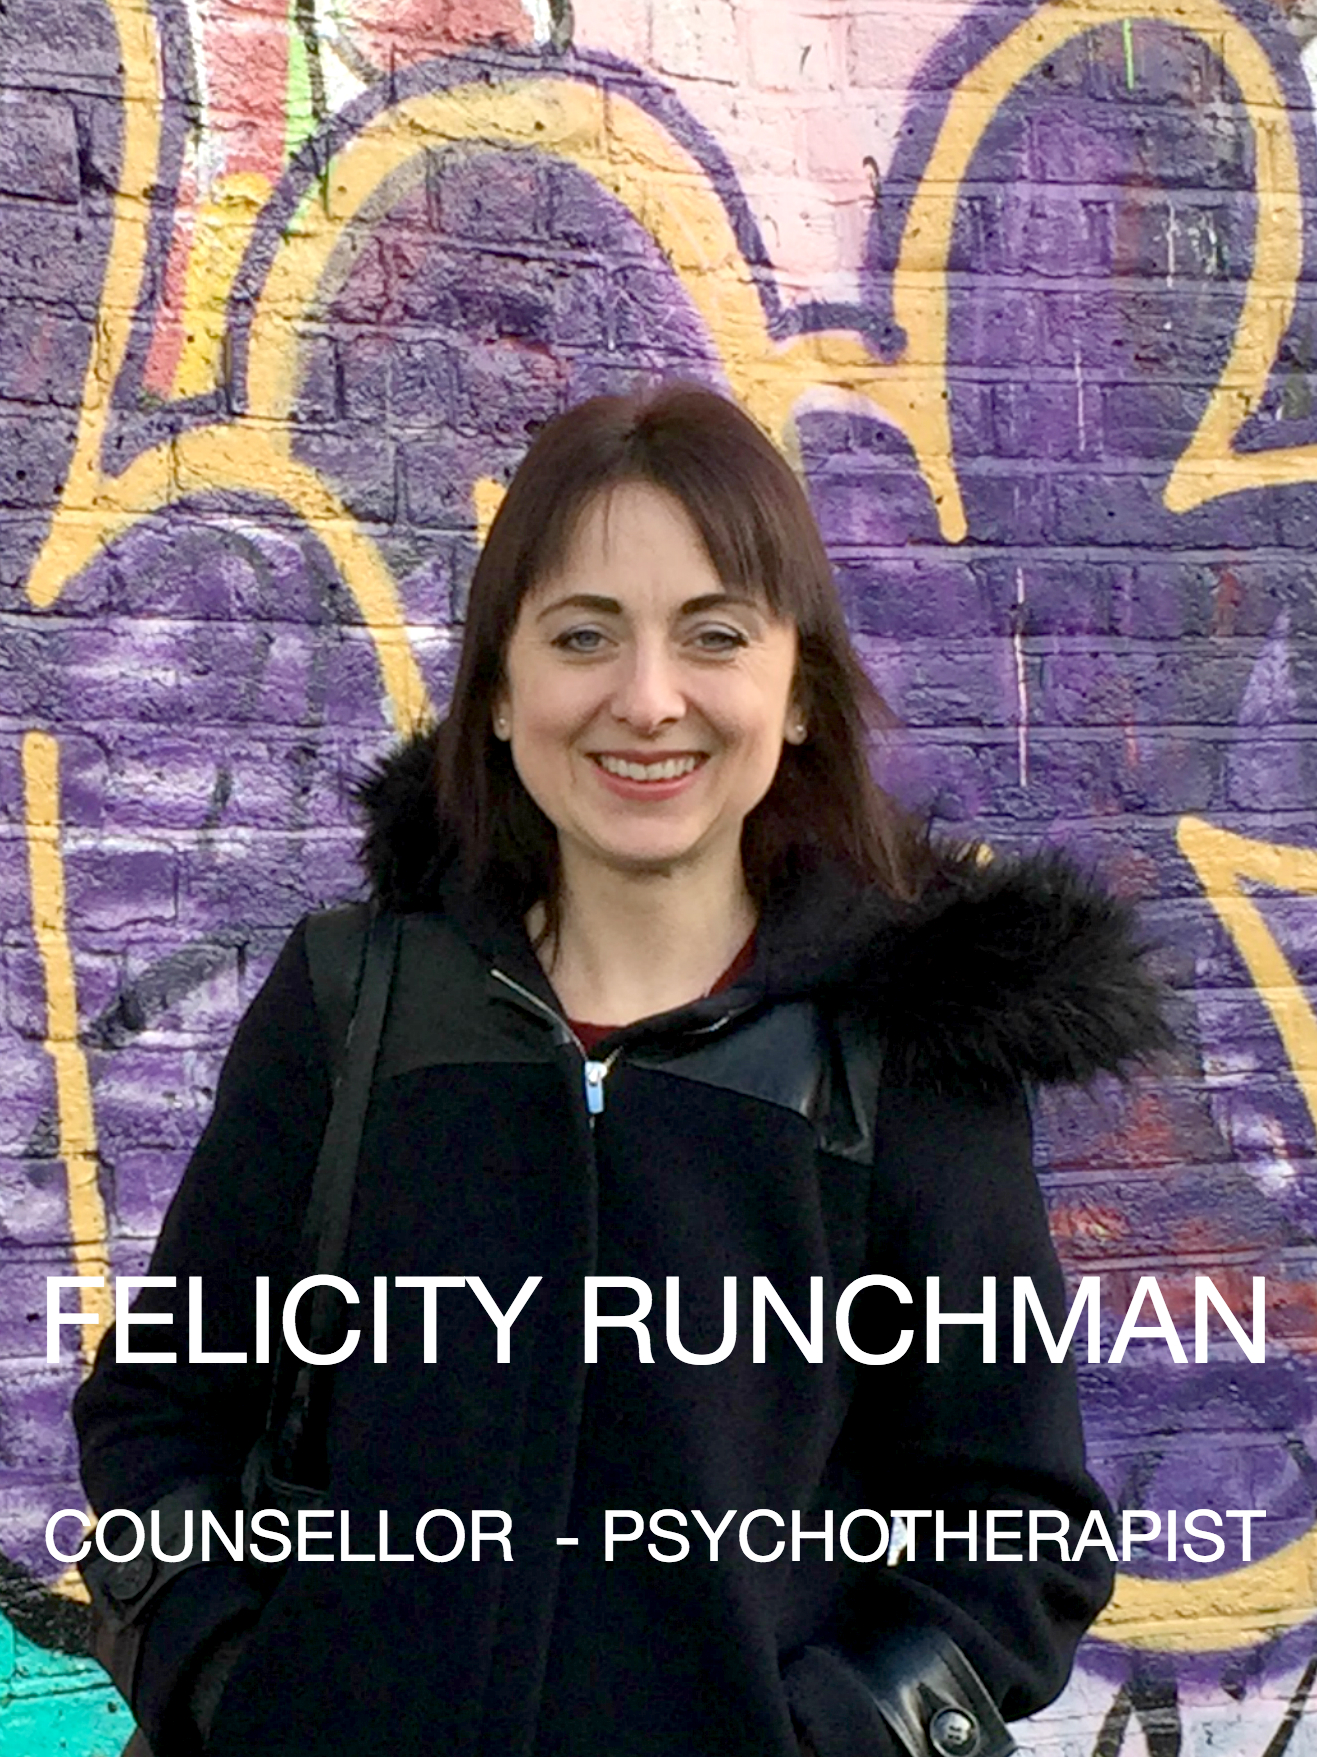 Felicity runchman g